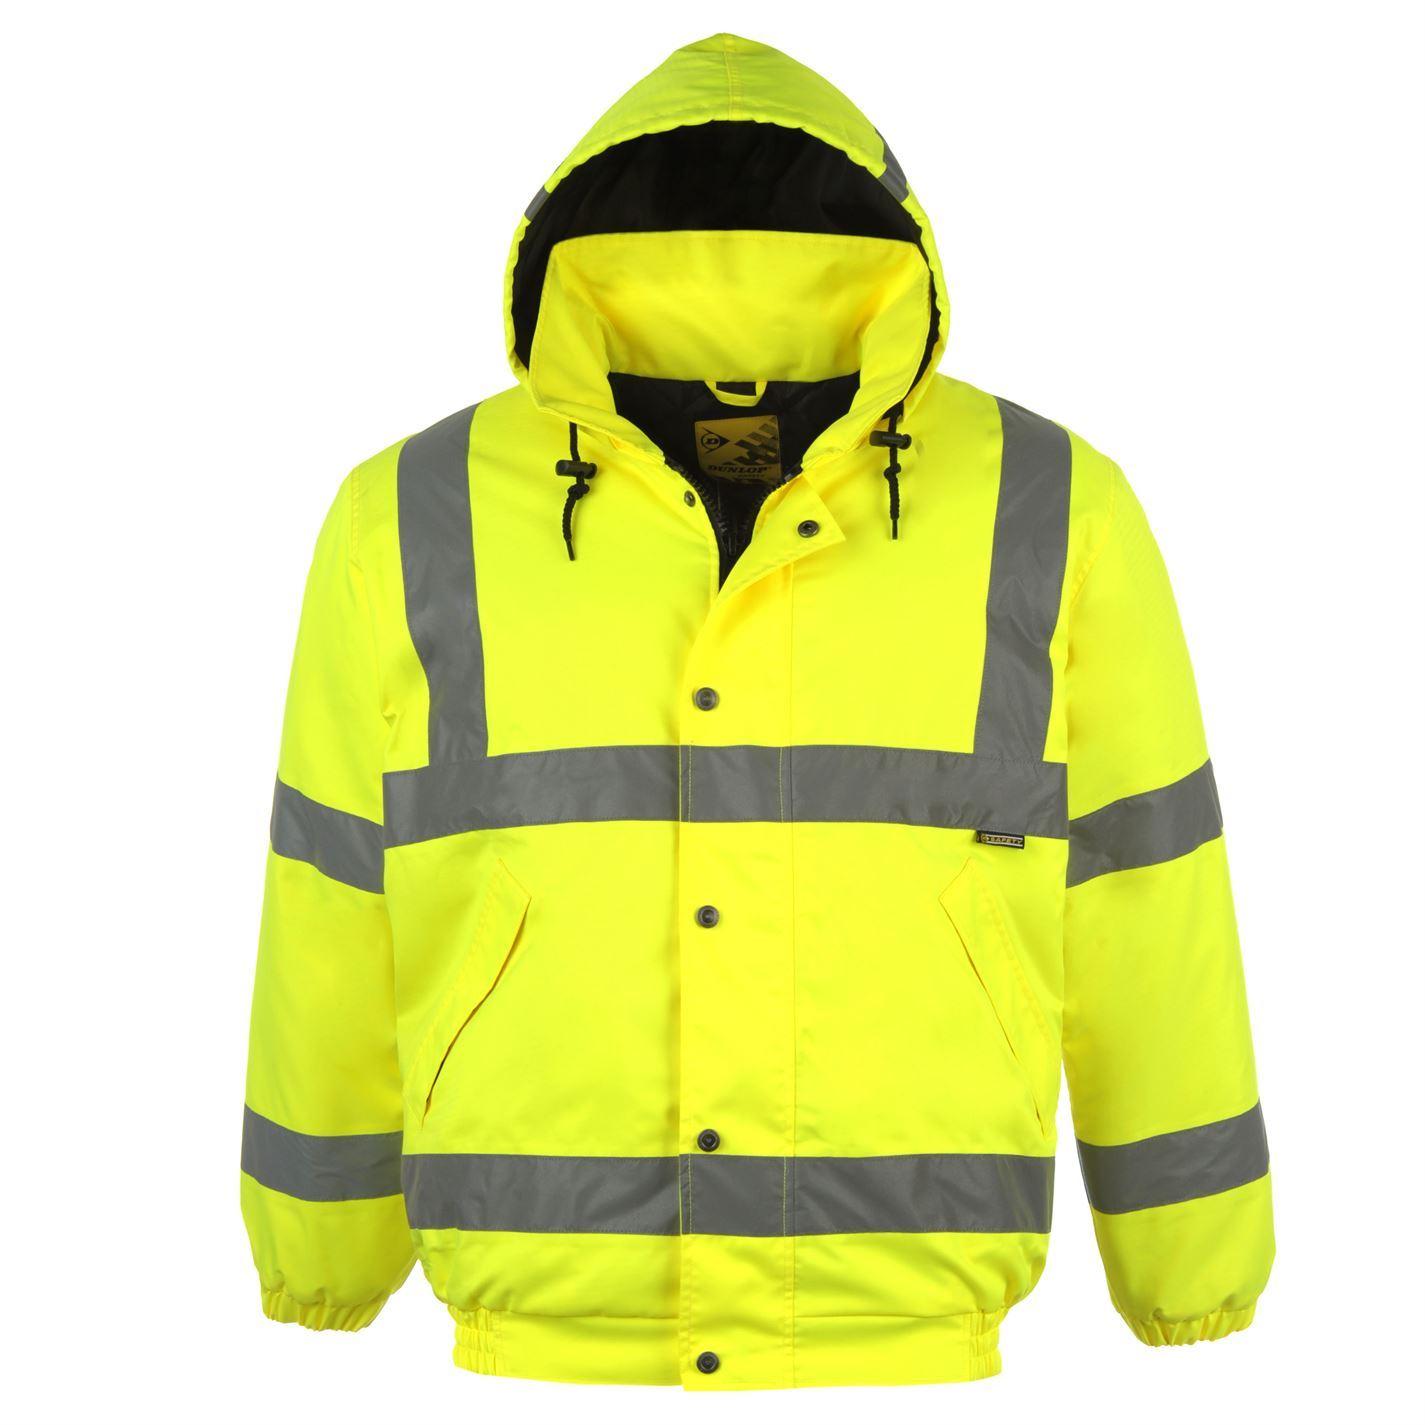 Details about Dunlop Hi Vis Bomber Safety Jacket Mens Yellow